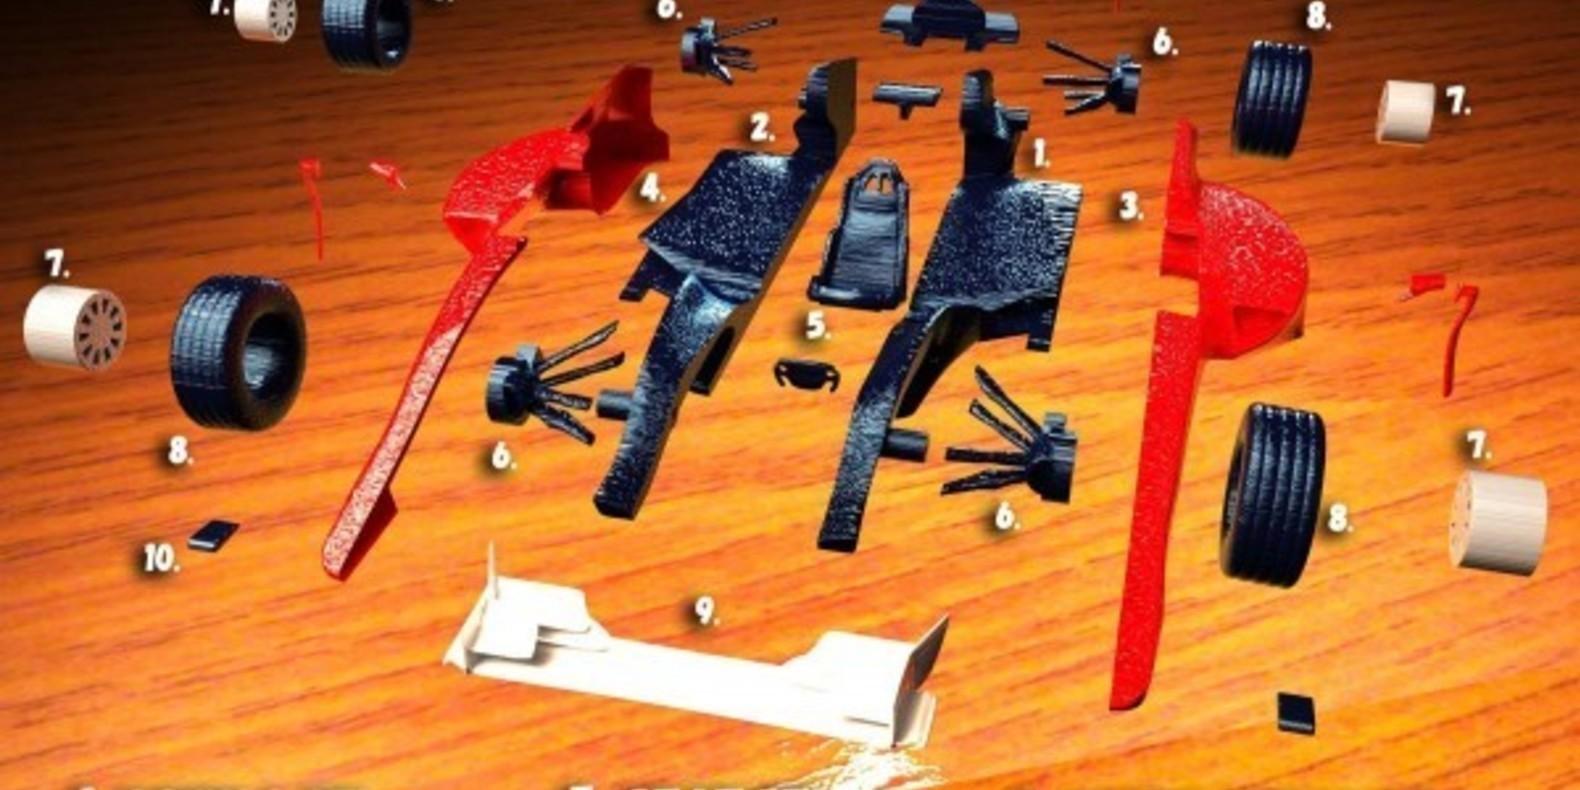 Ferrari F1 2015 mao casella maurizio 3D printed maquette model imprimé en 3D fichier STL cults 5